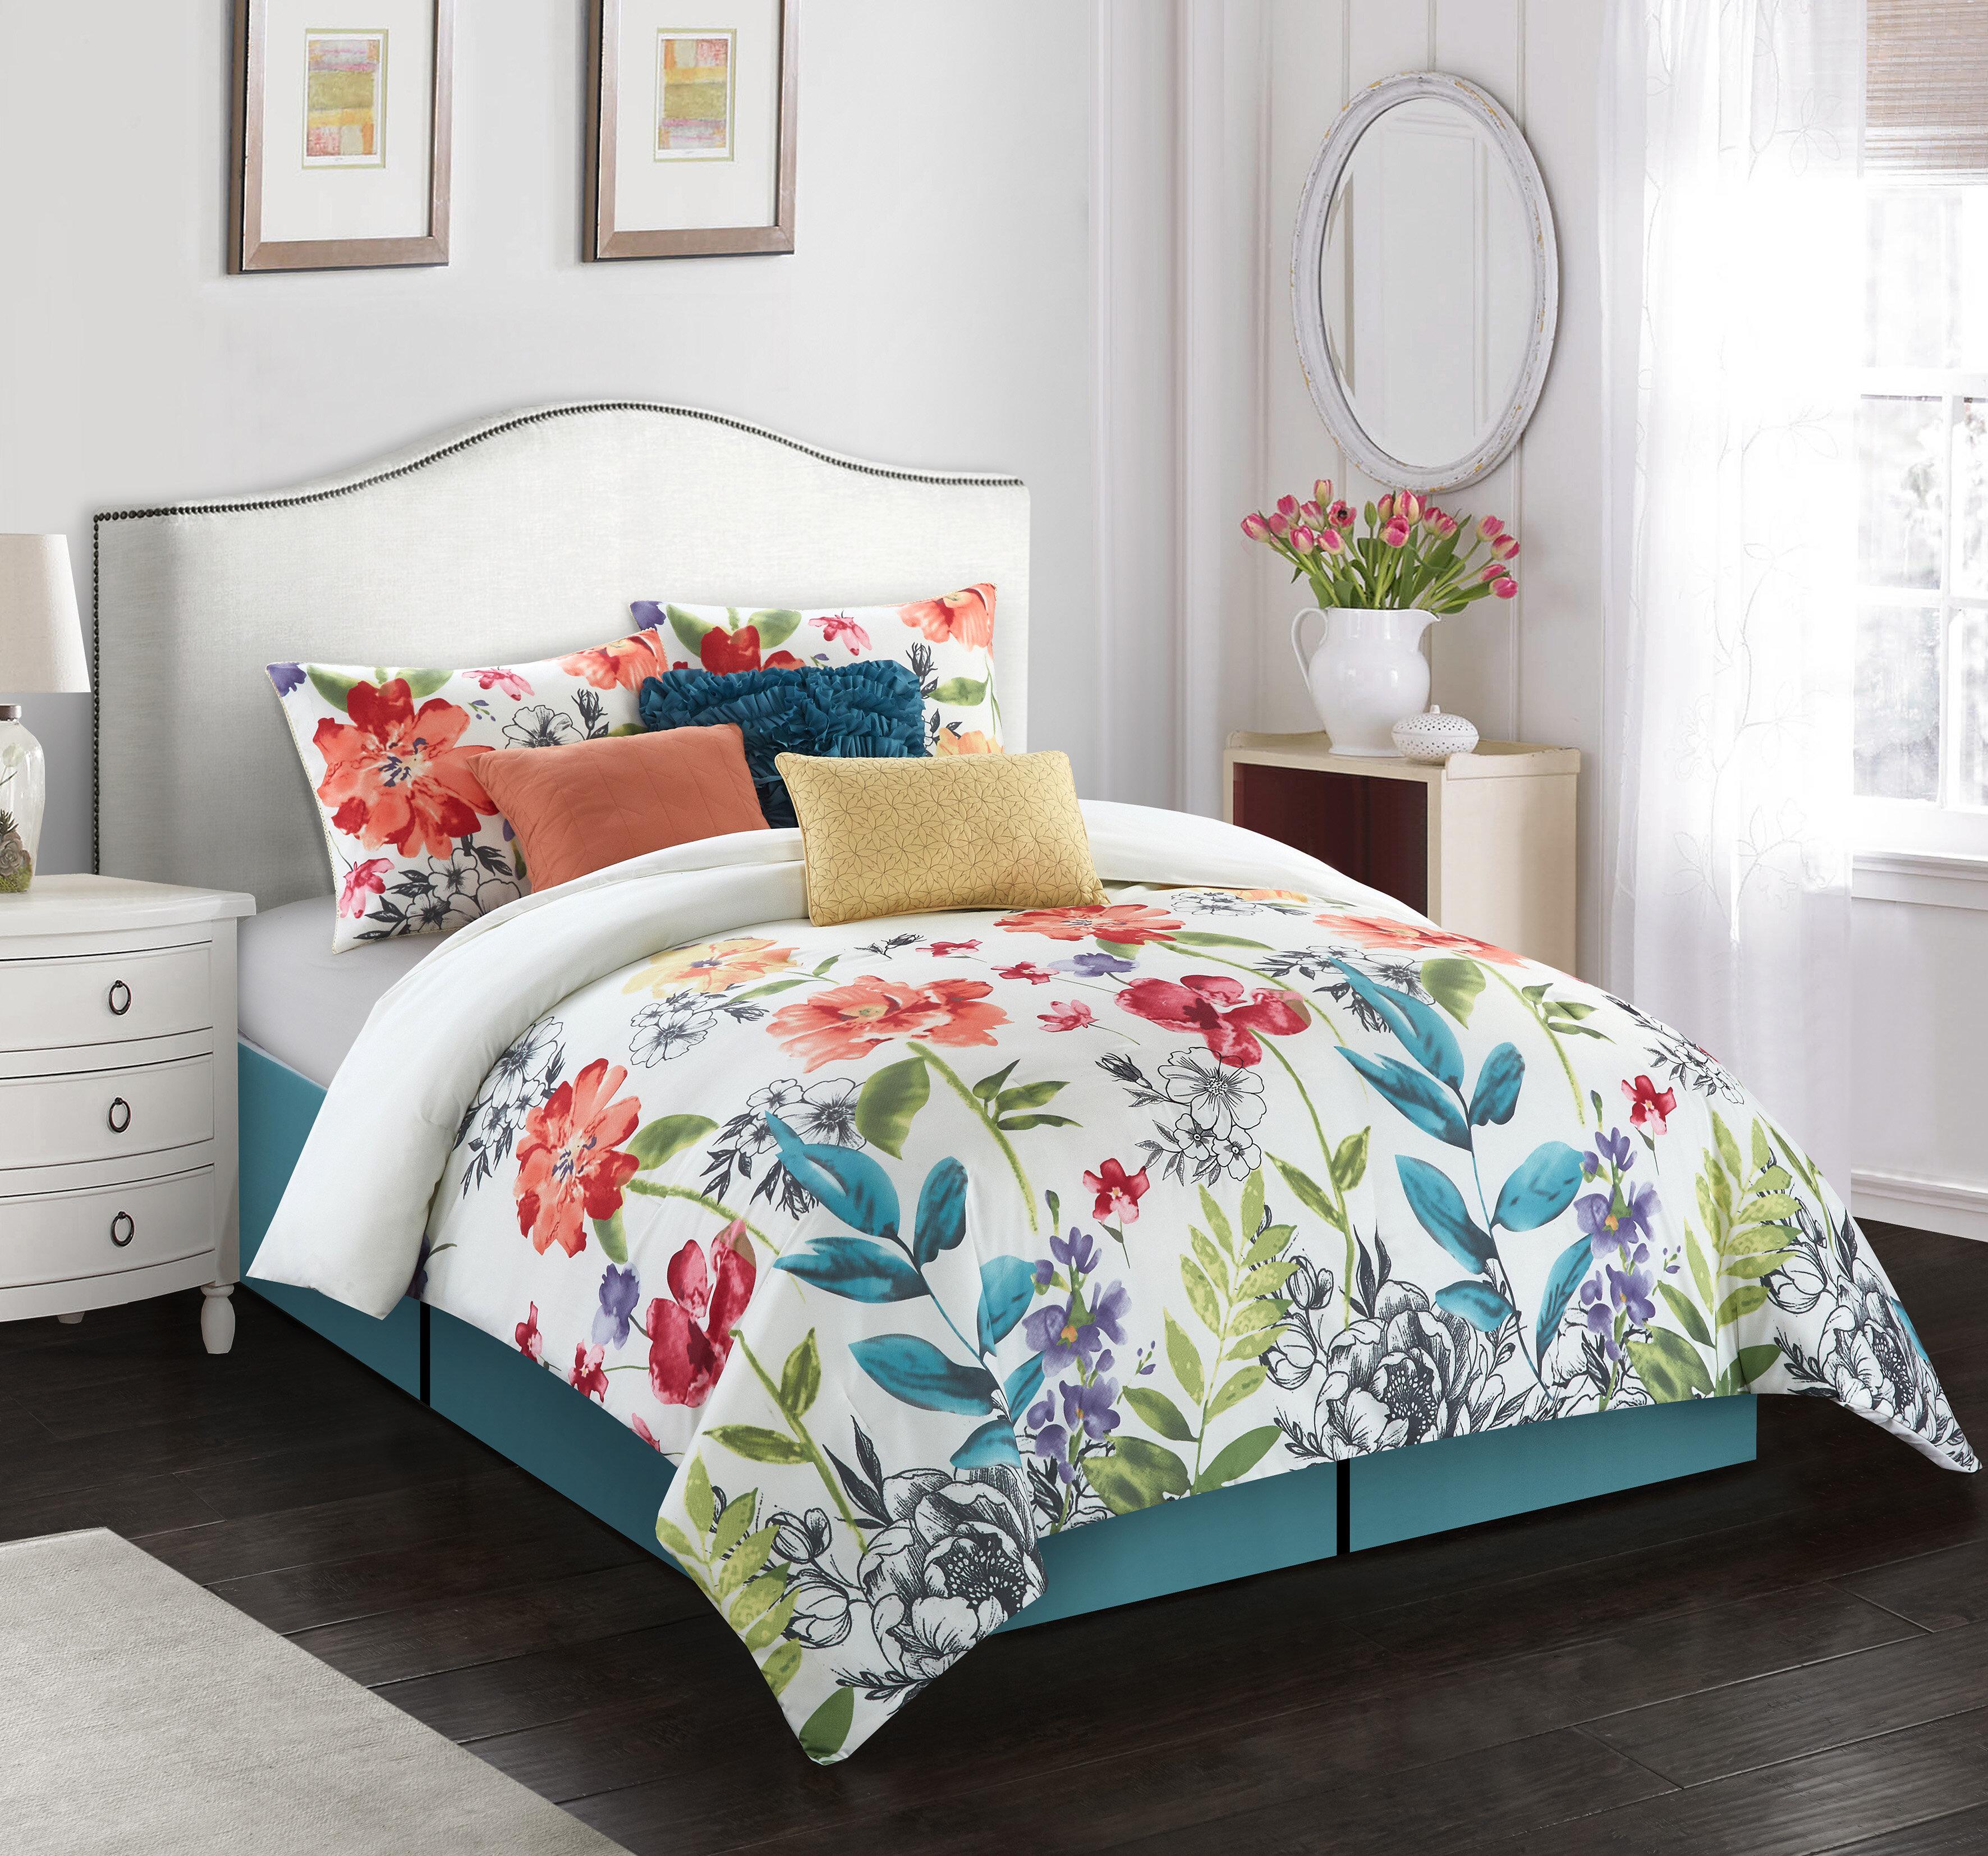 Green Comforters Free Shipping Over 35 Wayfair